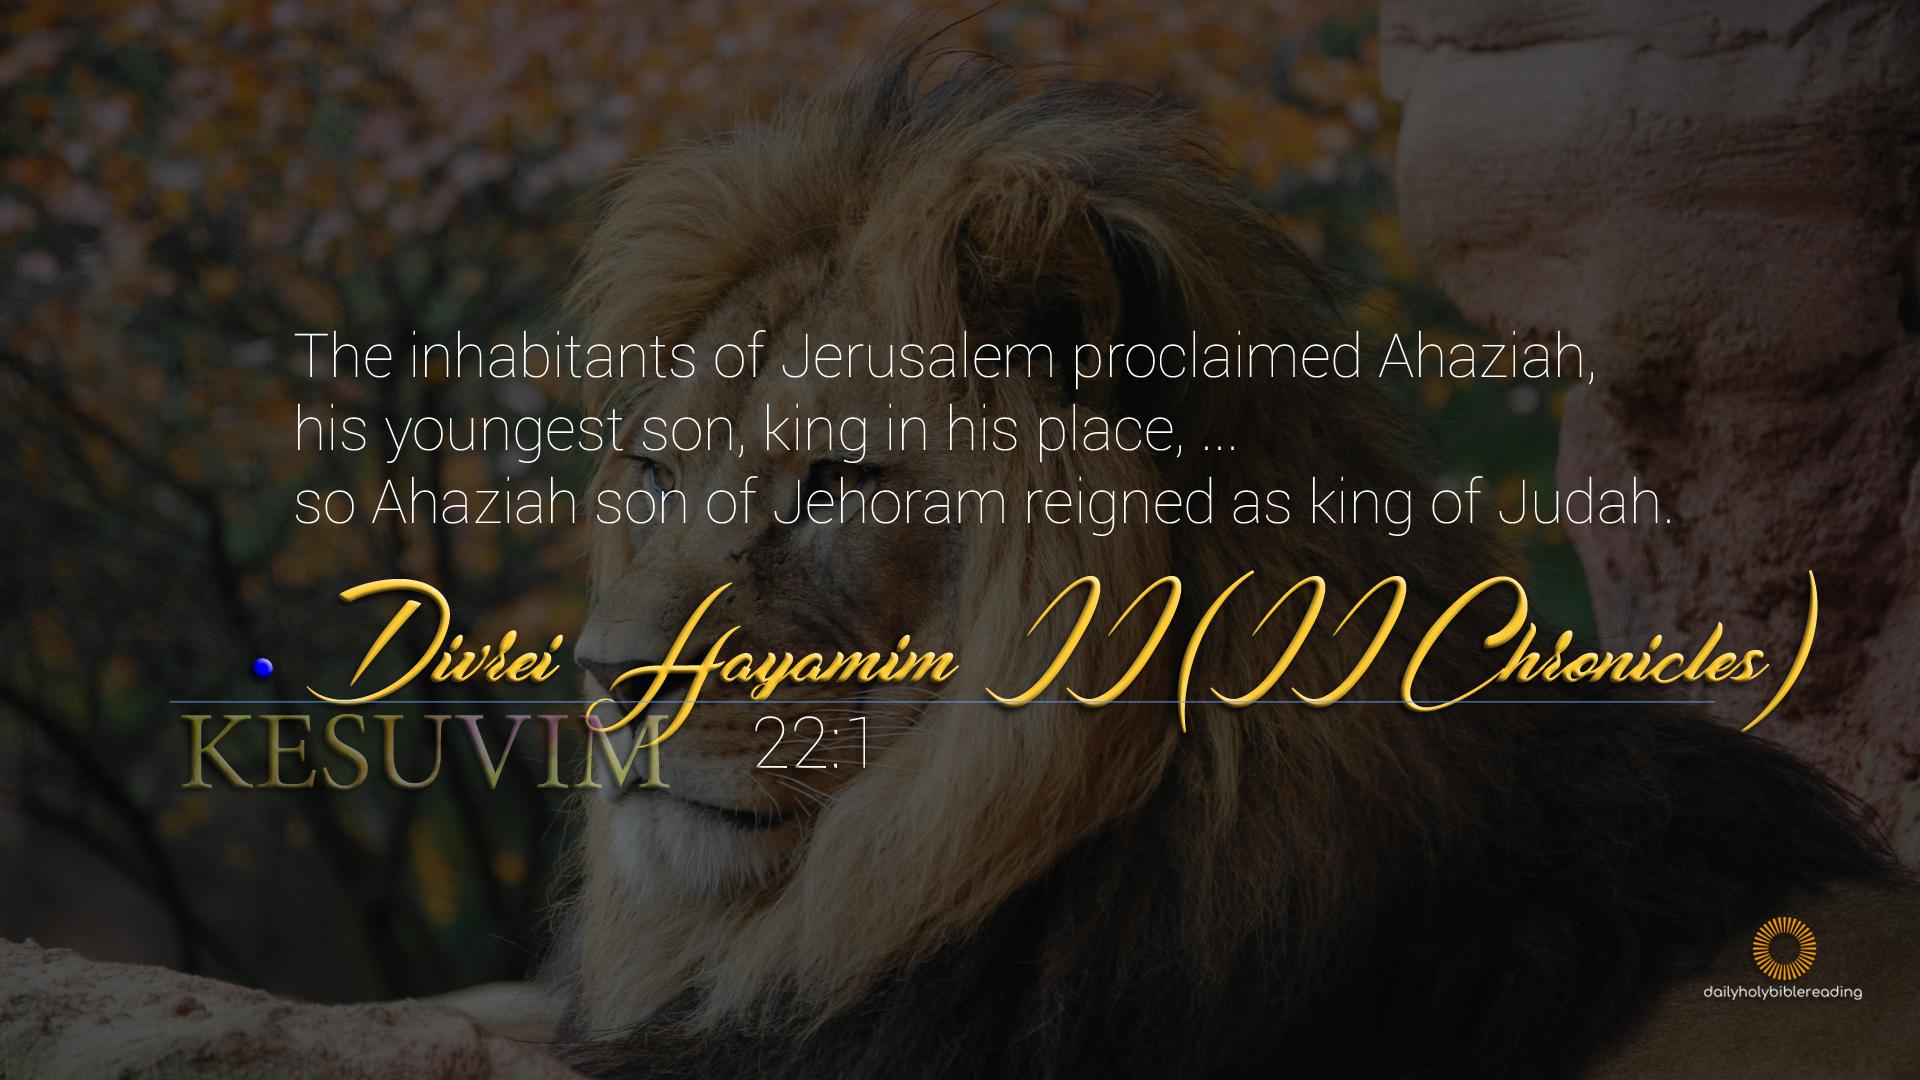 Divrei Hayamim II (II CHRONICLES) | This Is TRUTH